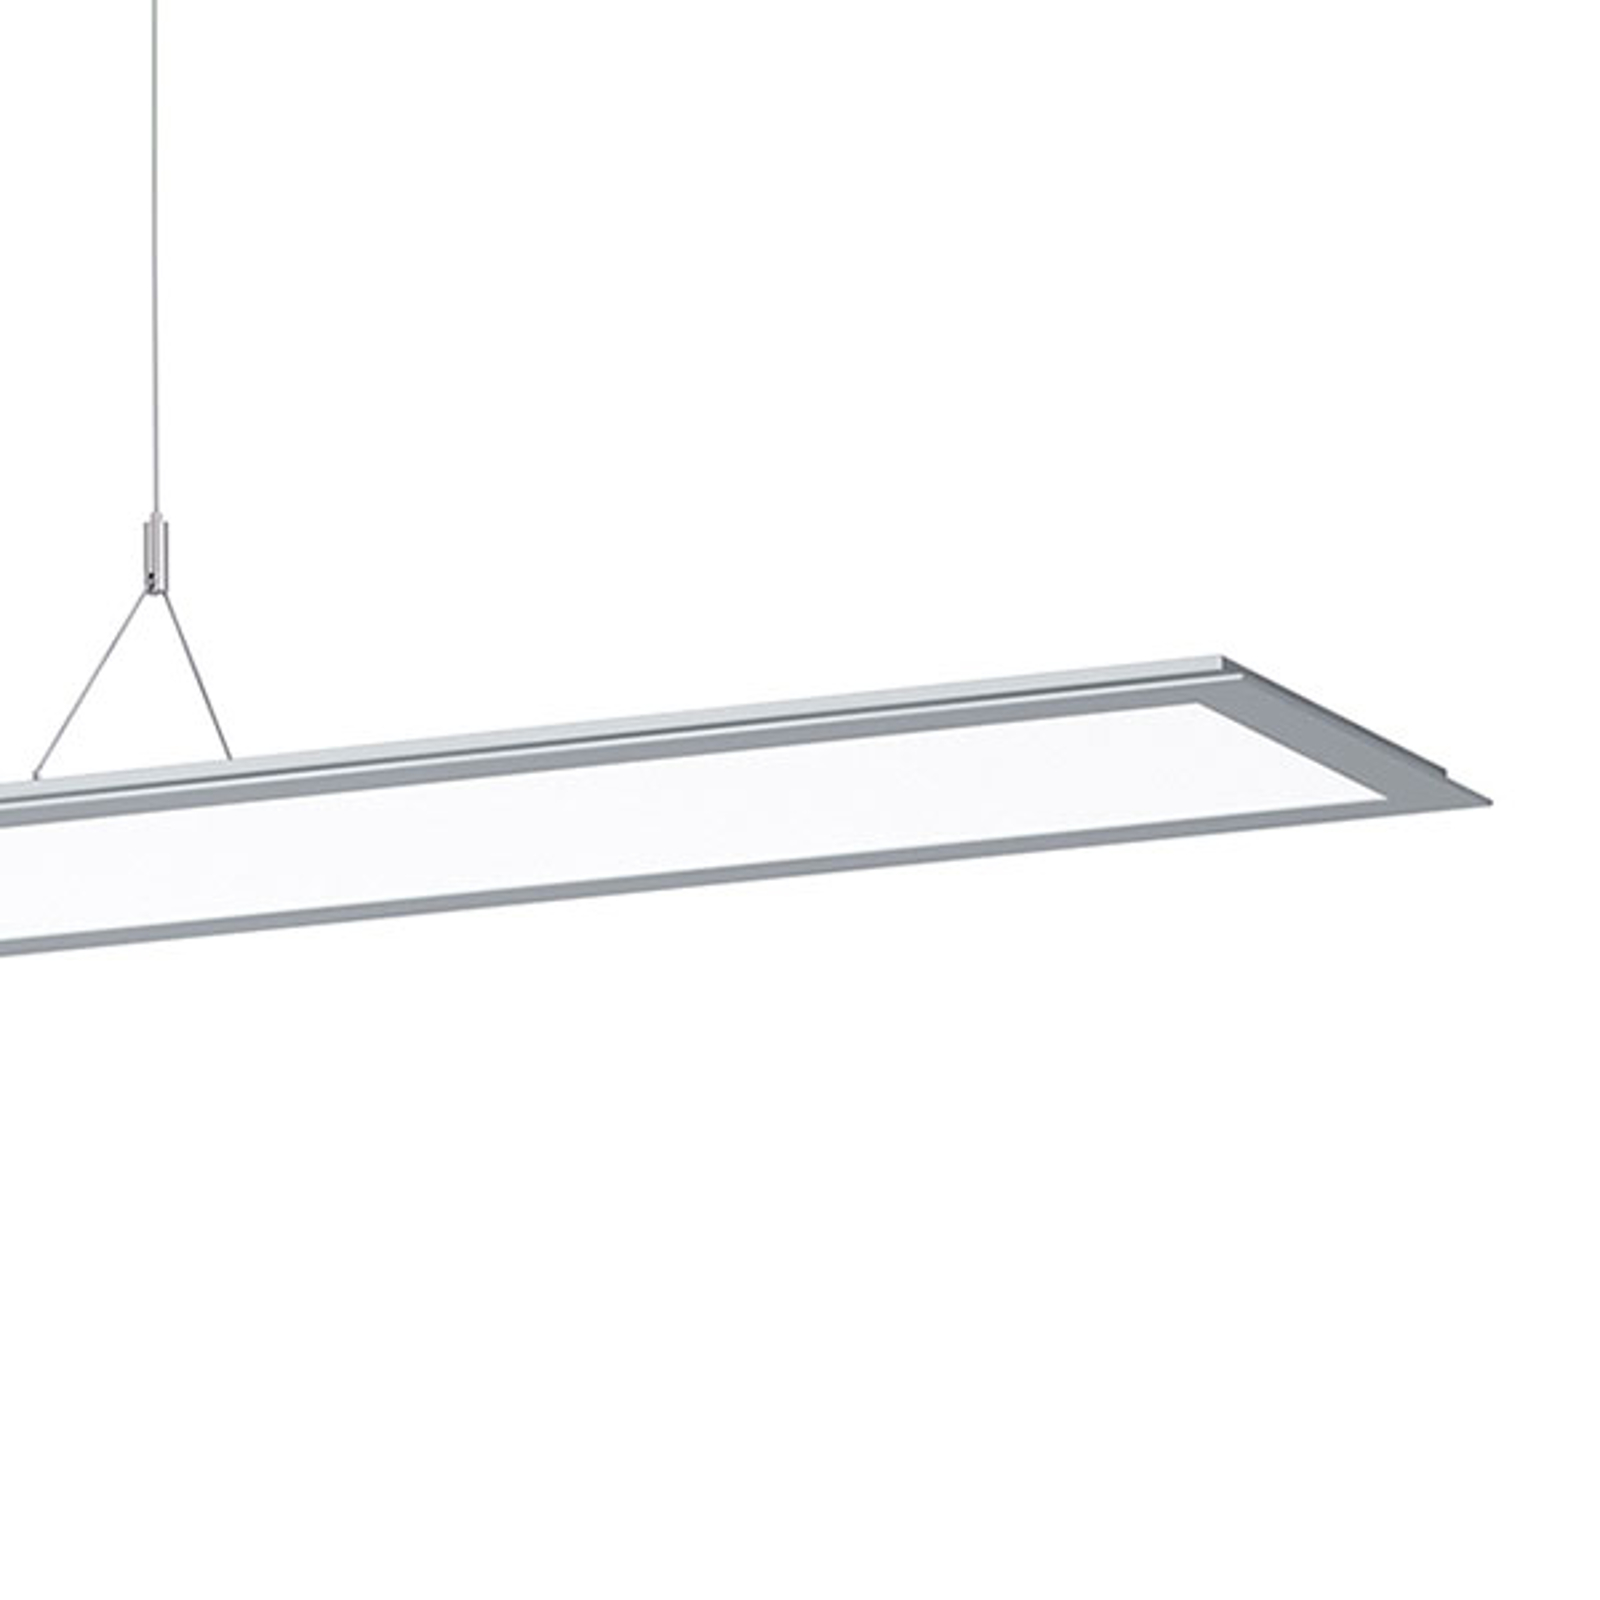 Lampa wisząca LED SL713PL, 124 cm, 9.250 lm, szara